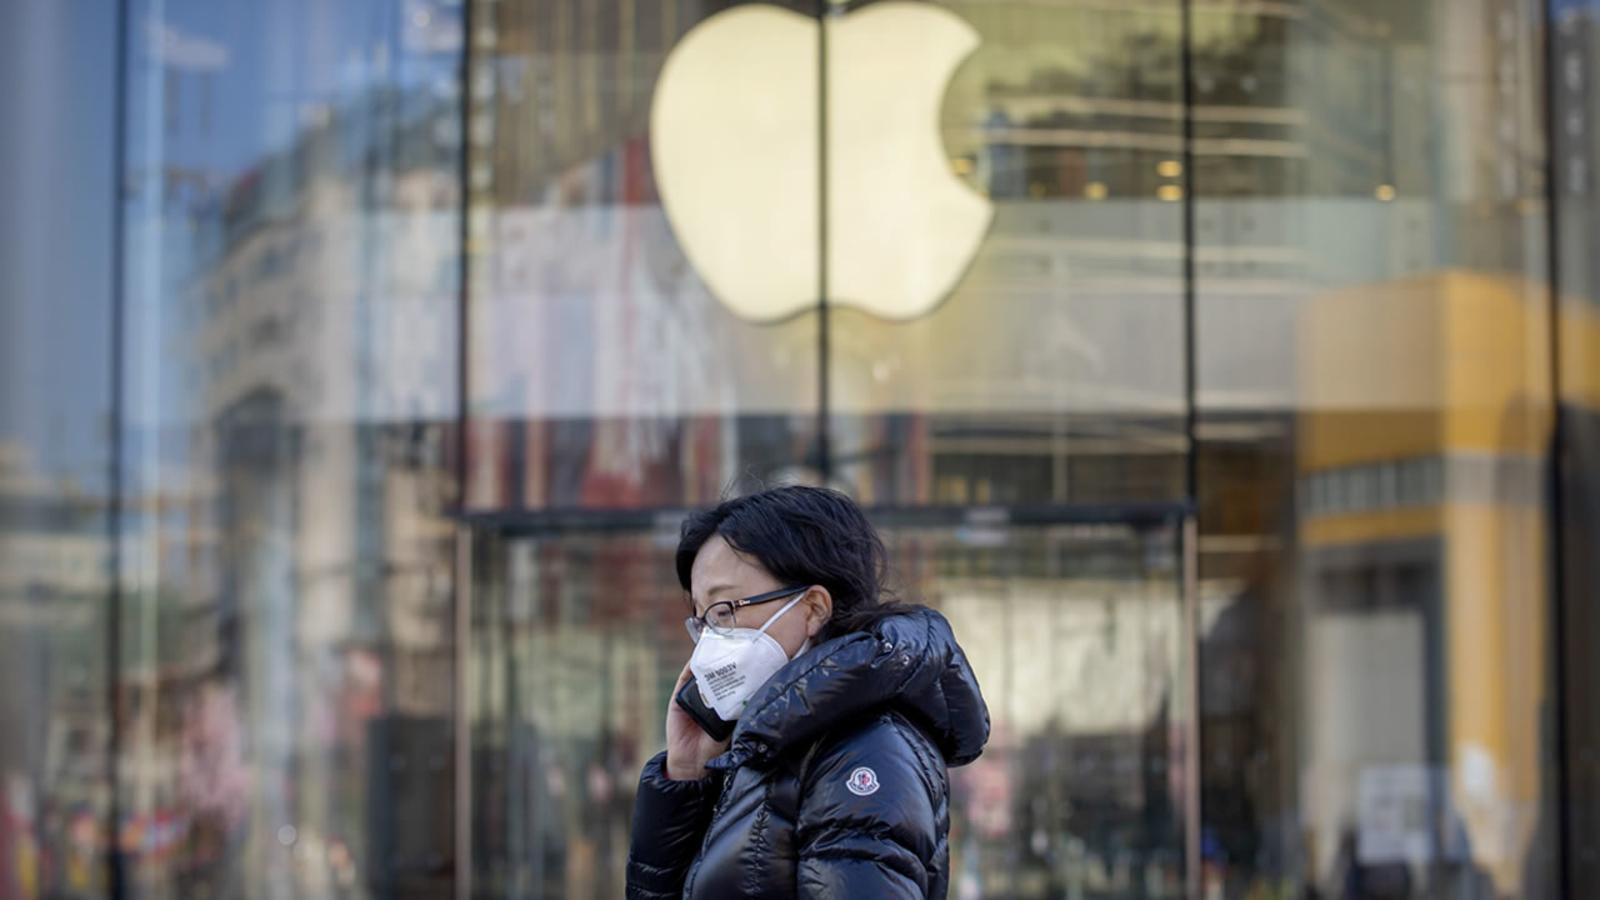 Coronavirus: Apple warns China virus will cut iPhone production, sales